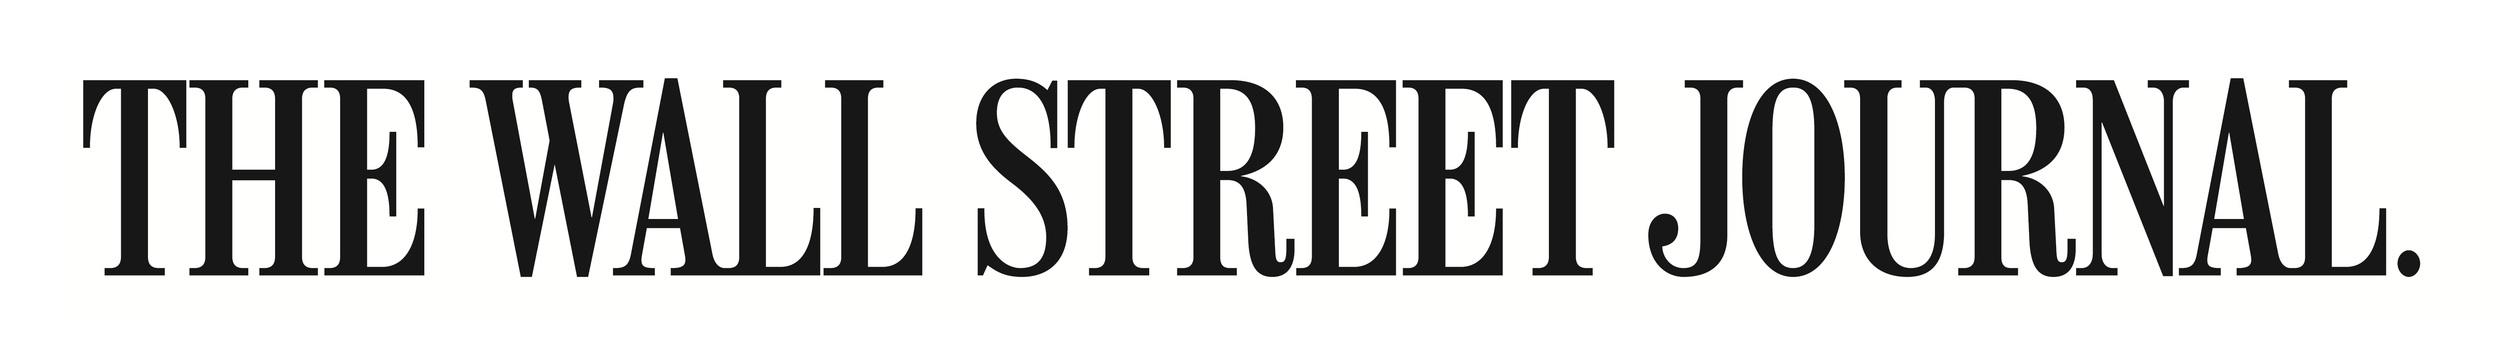 the-wall-street-journal-logo-wsj